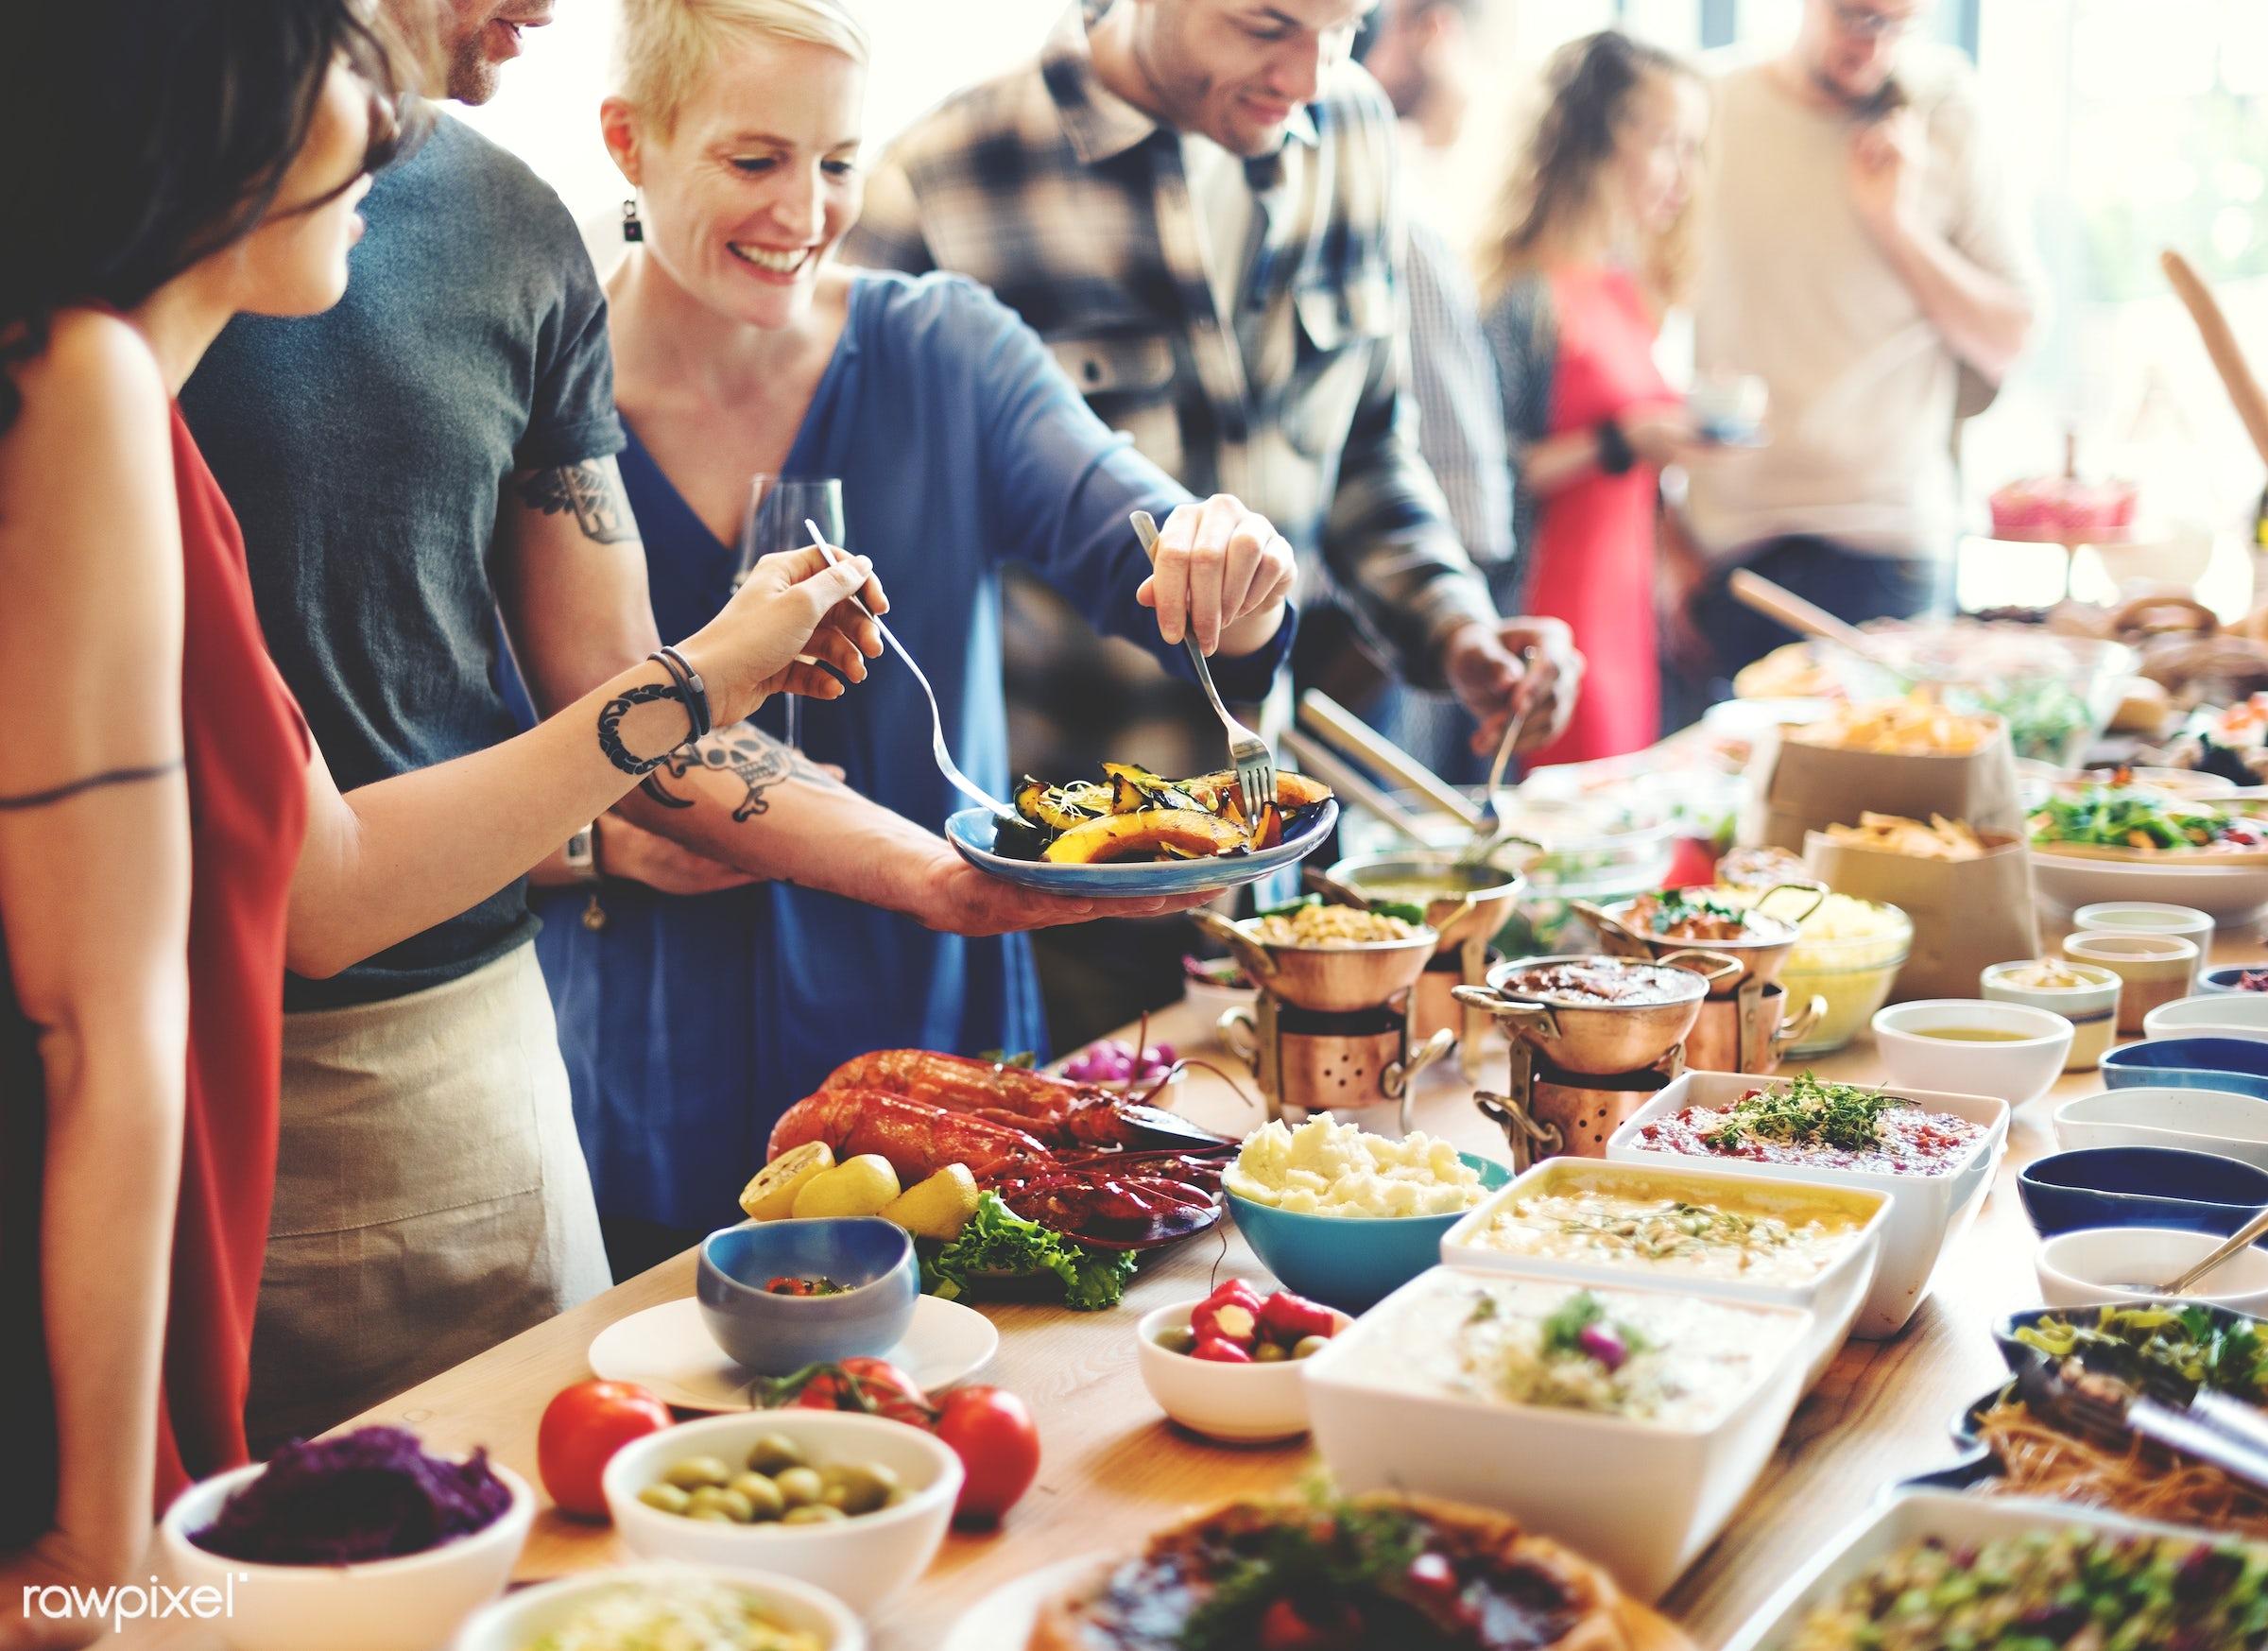 wine, asian food, brunch, buffet, cafe, celebration, choice, crowd, dessert, diet, dining, dinner, diversity, drinking, eat...